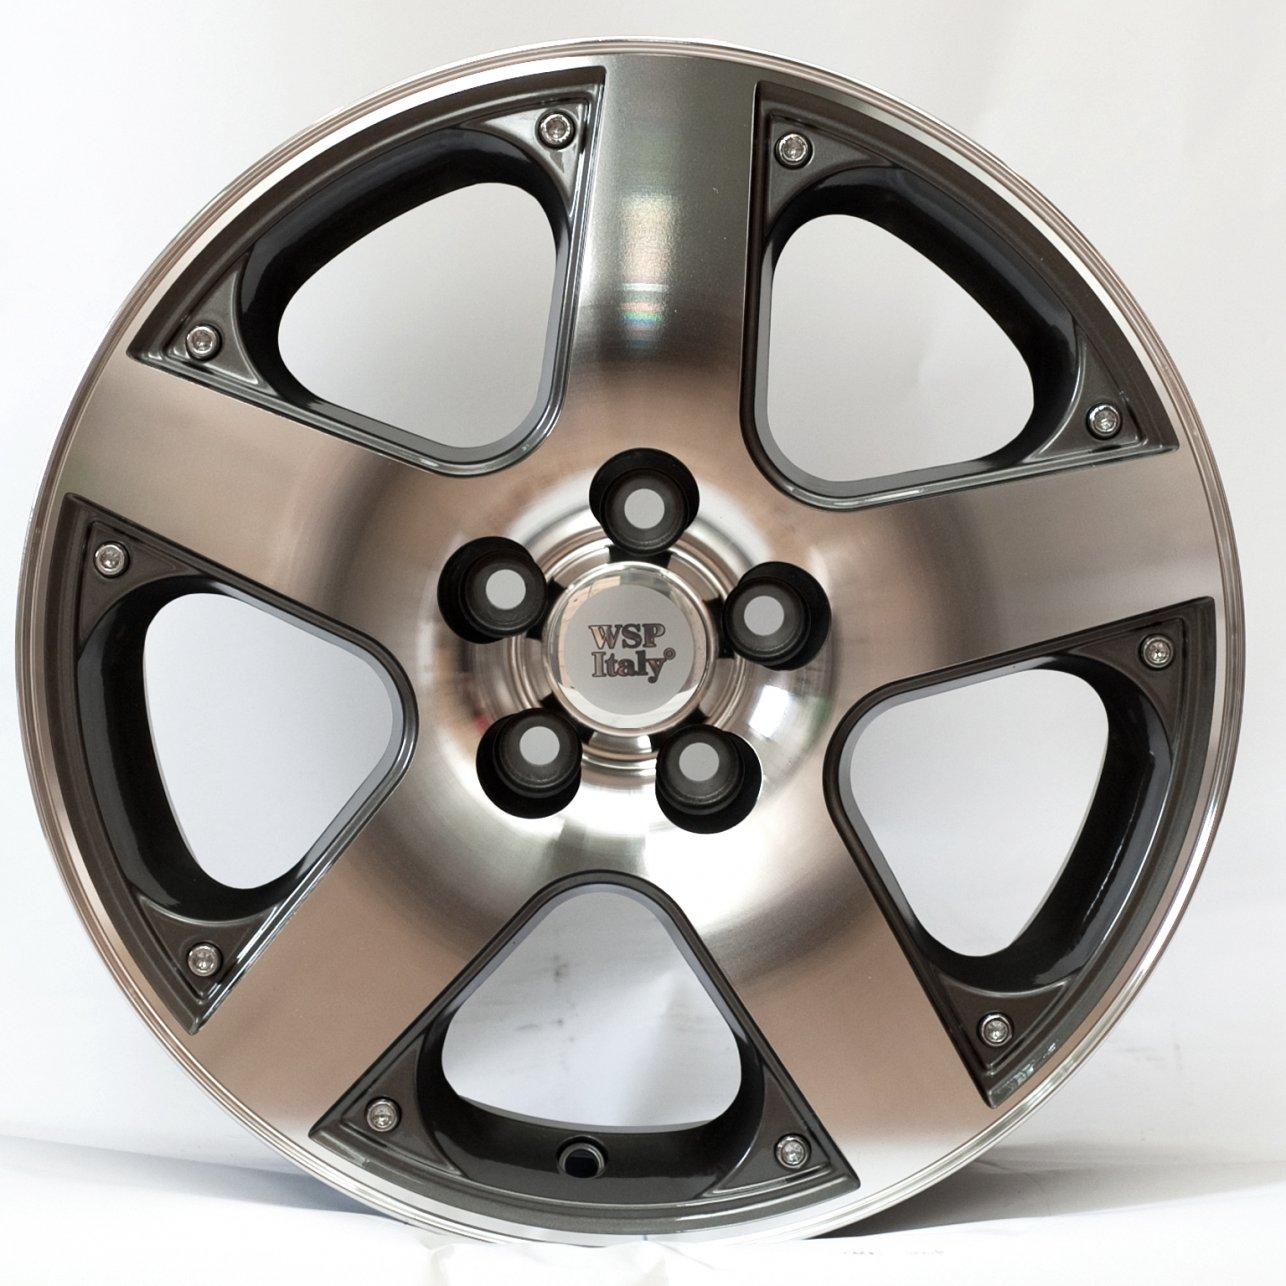 WSP Italy Volkswagen (W430) Sorrento 6,5x15 5x100 ET35 DIA57,1 (anthracite polished)